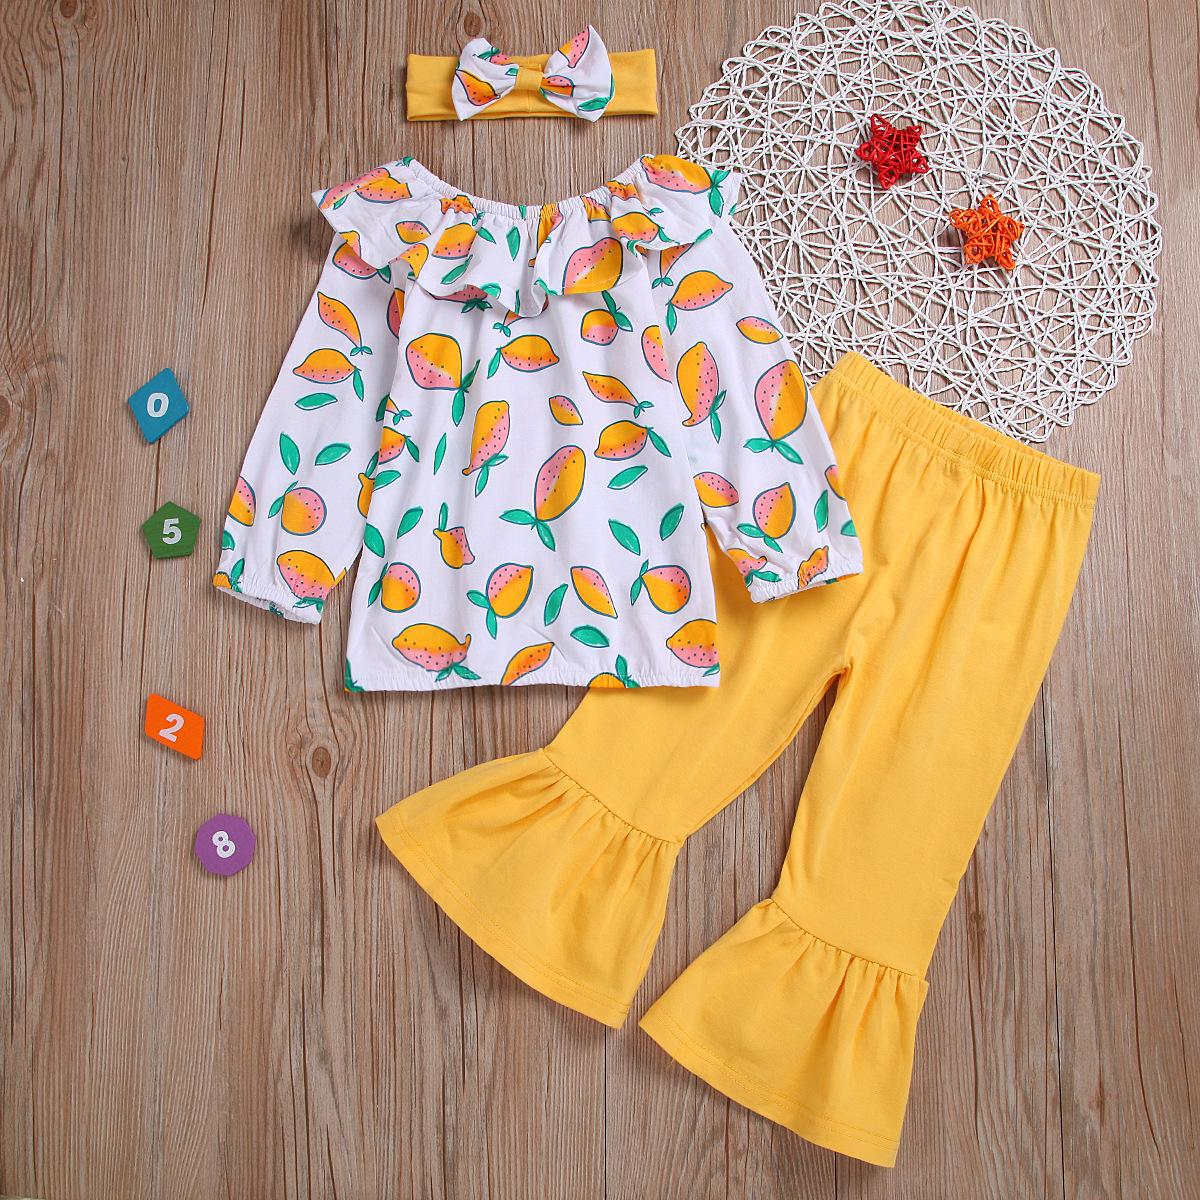 llamarada manga larga 3pcs pantalones Set Top + + sombreros ropa de la muchacha niños del otoño Establece Moda Traje Niño Lindo